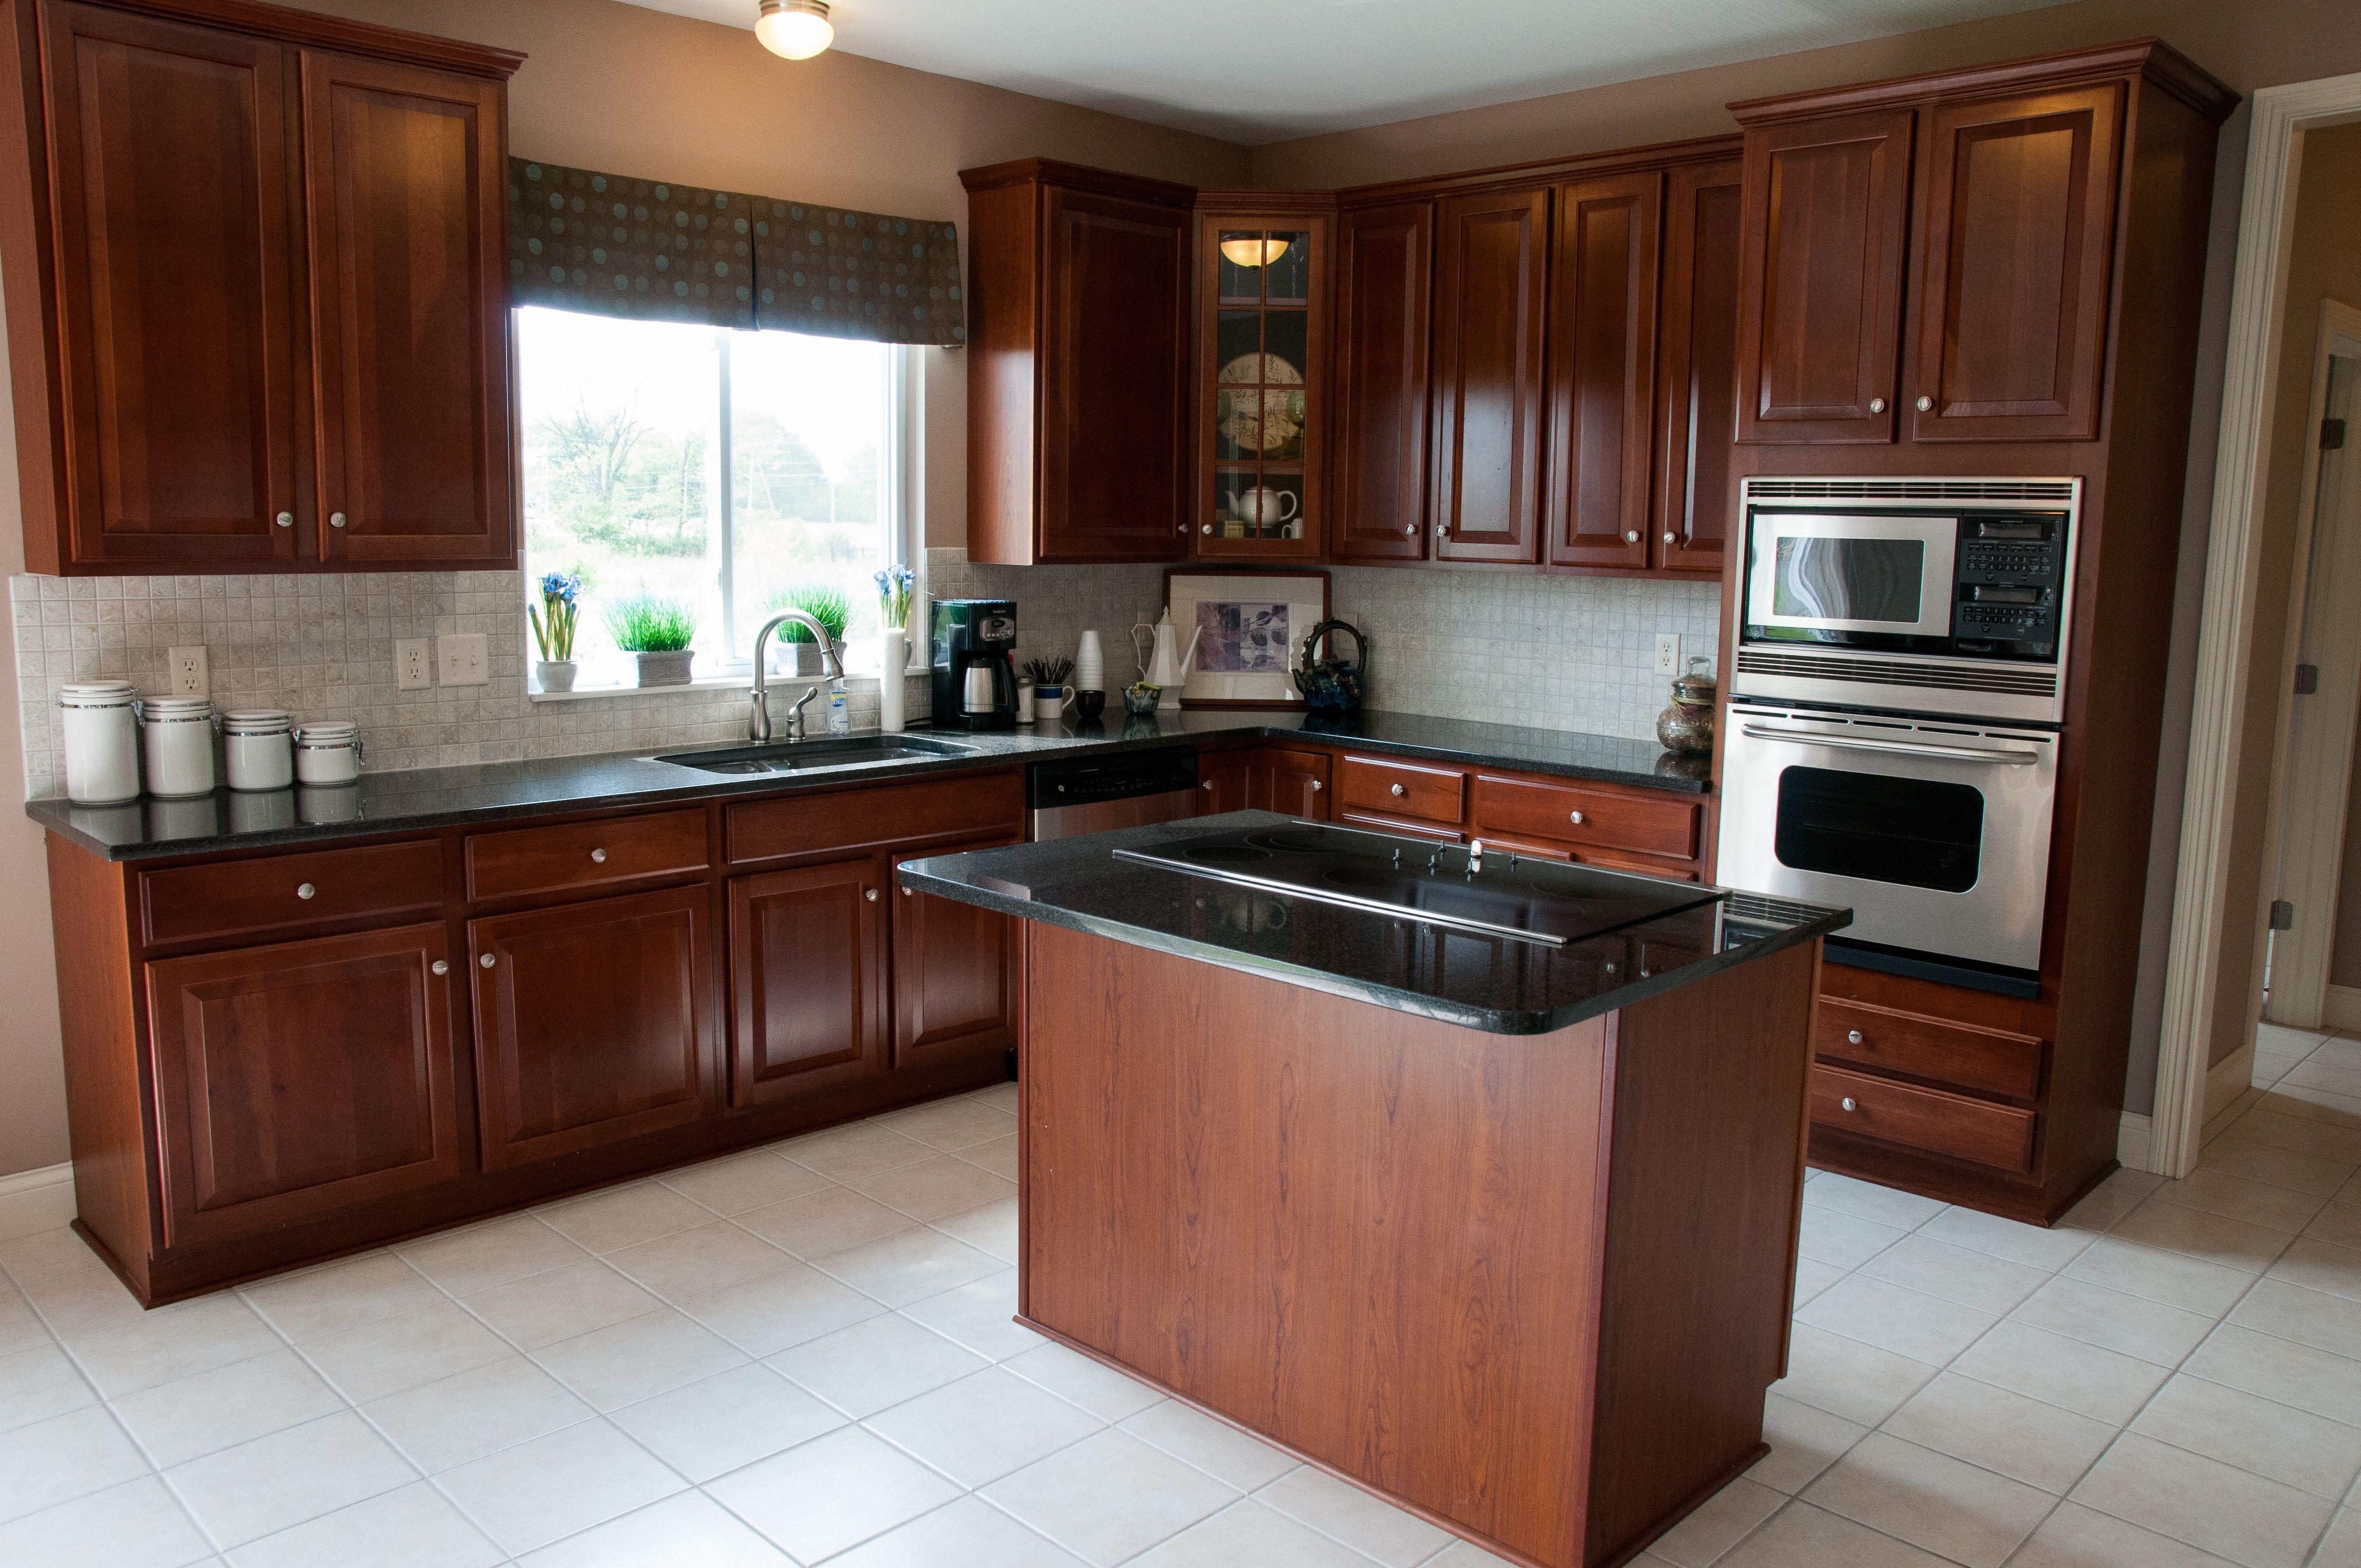 Aberdeen Multi Family Homes For Sale Columbus Ohio Spacious Kitchens Multi Family Homes Home